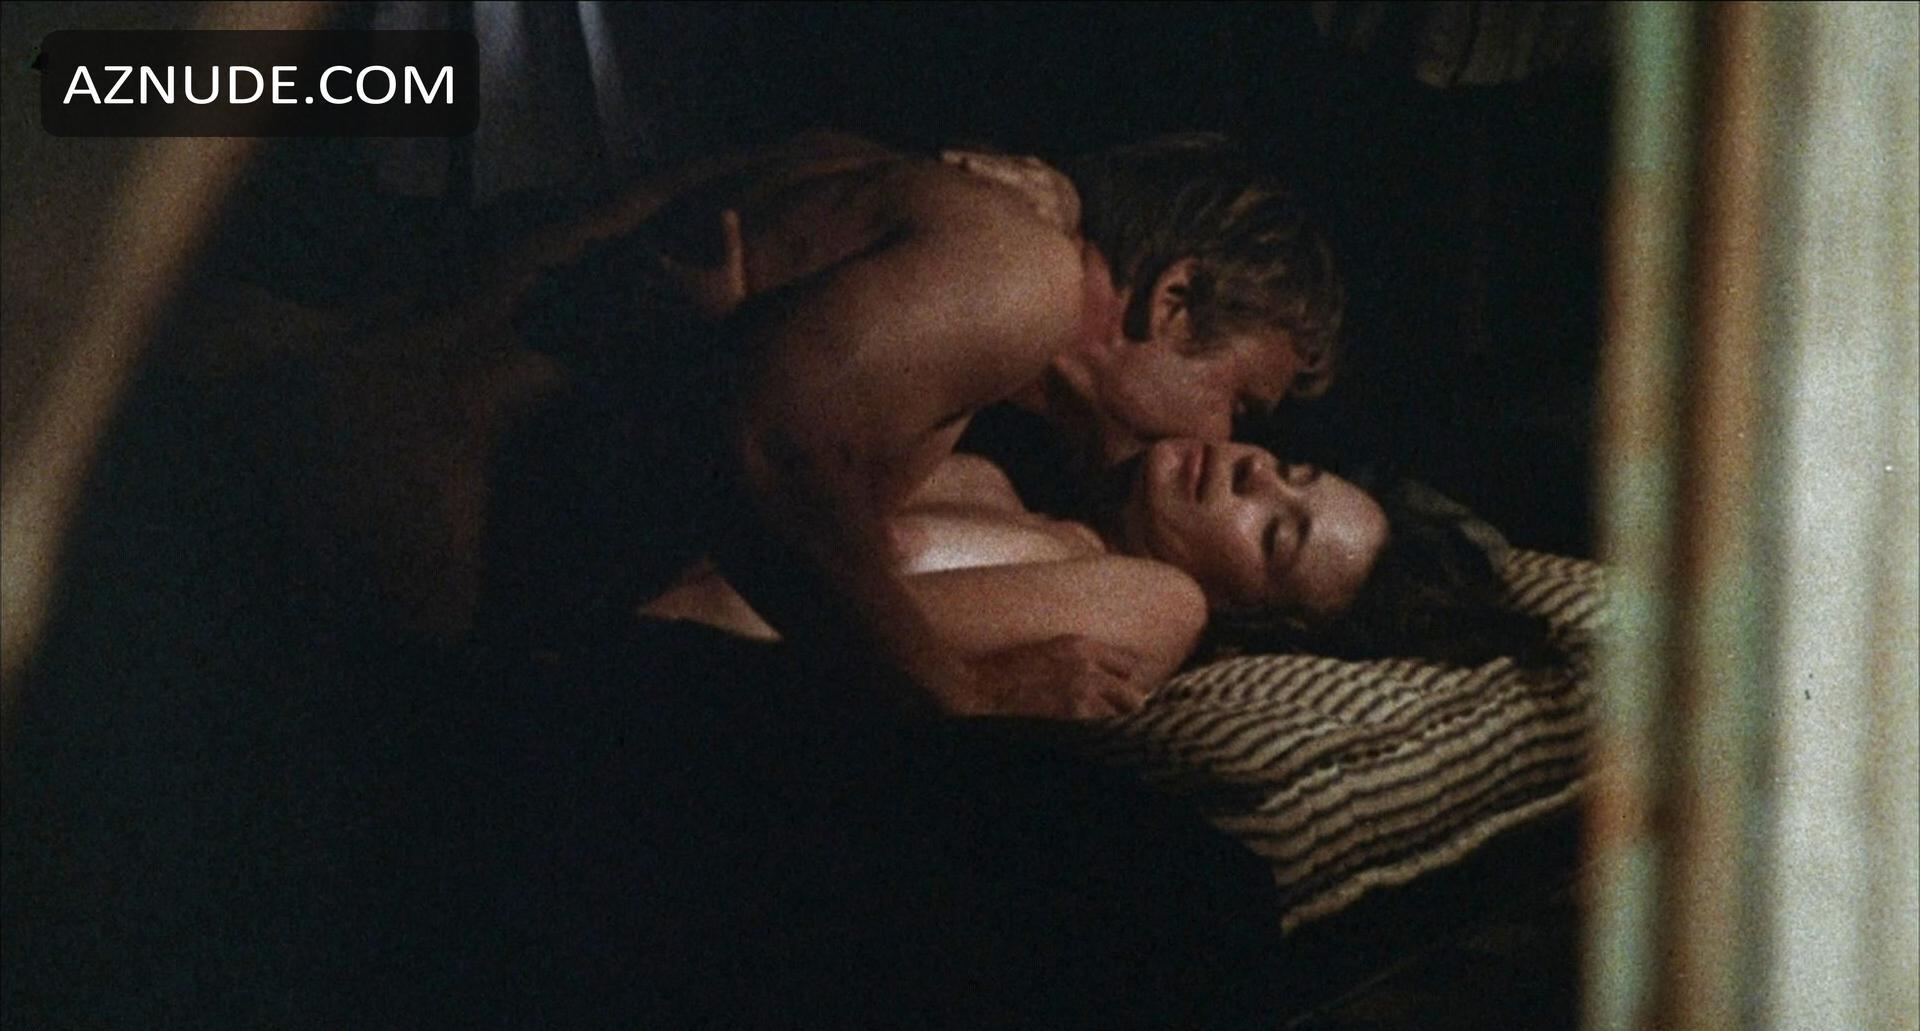 Angelina jolie nude mod 2 - 2 part 10